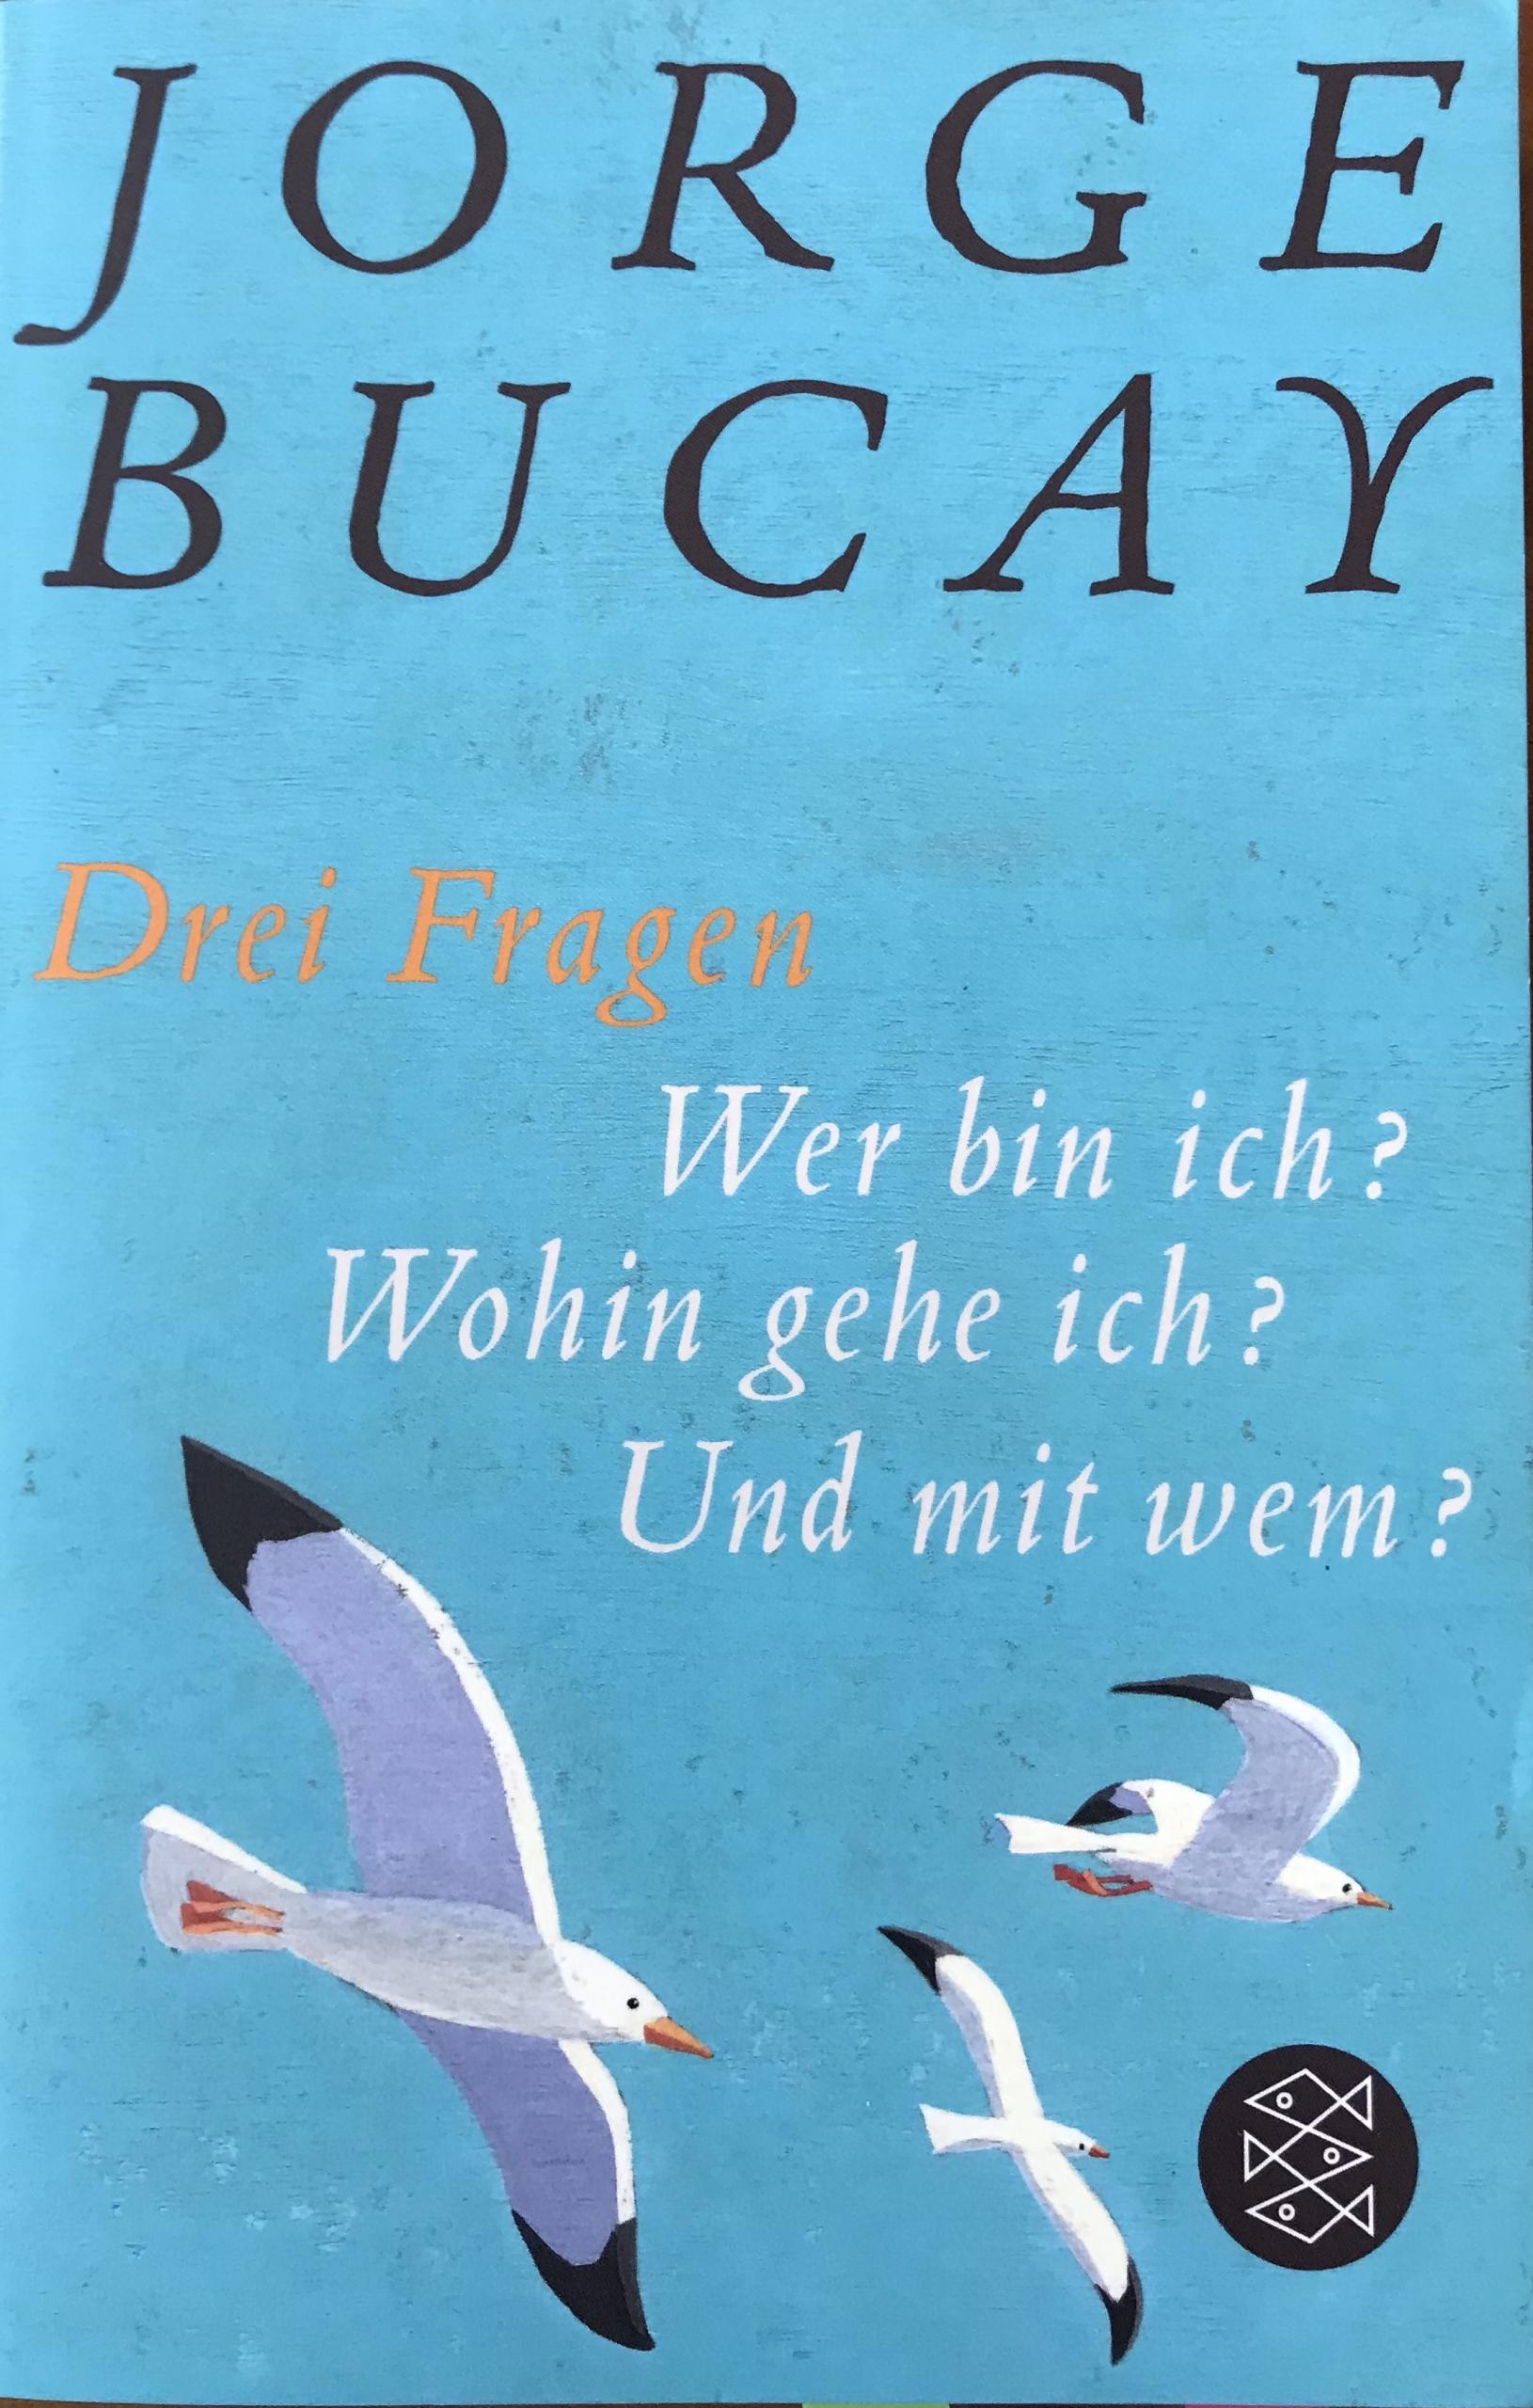 Jorge Bucay, 3 Fragen